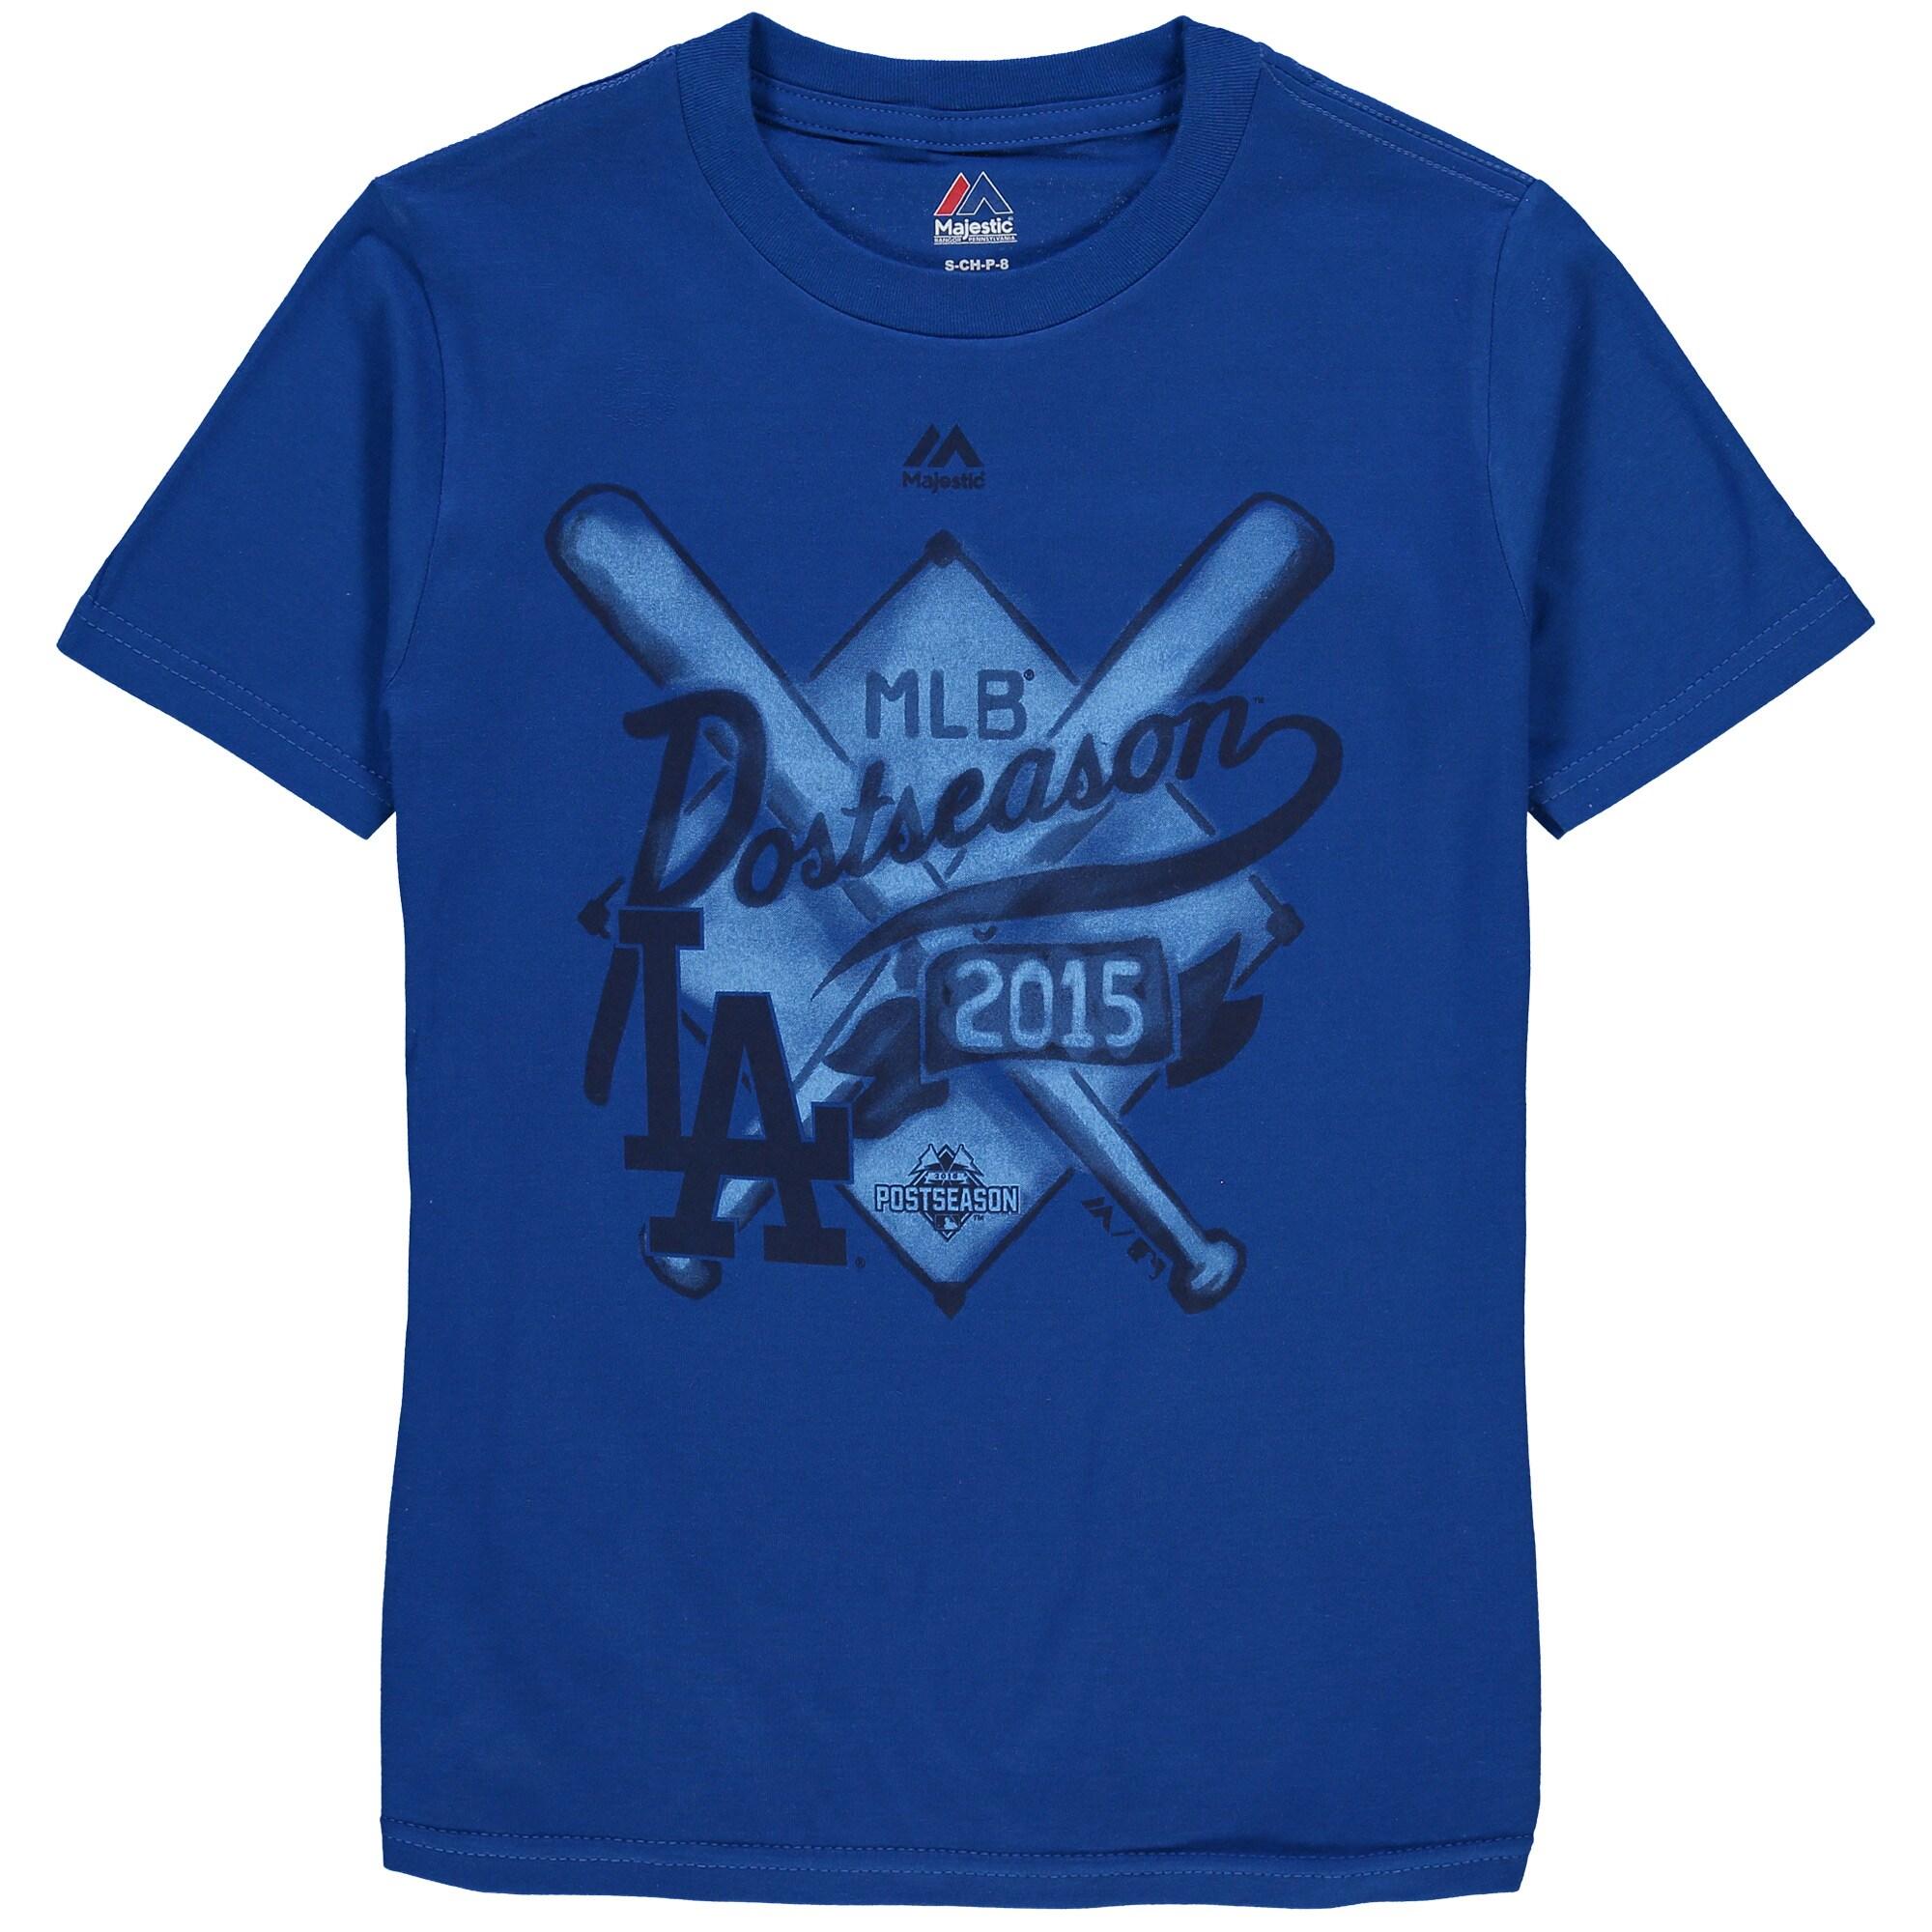 Los Angeles Dodgers Majestic Youth 2015 Postseason Team Ambition T-Shirt - Royal